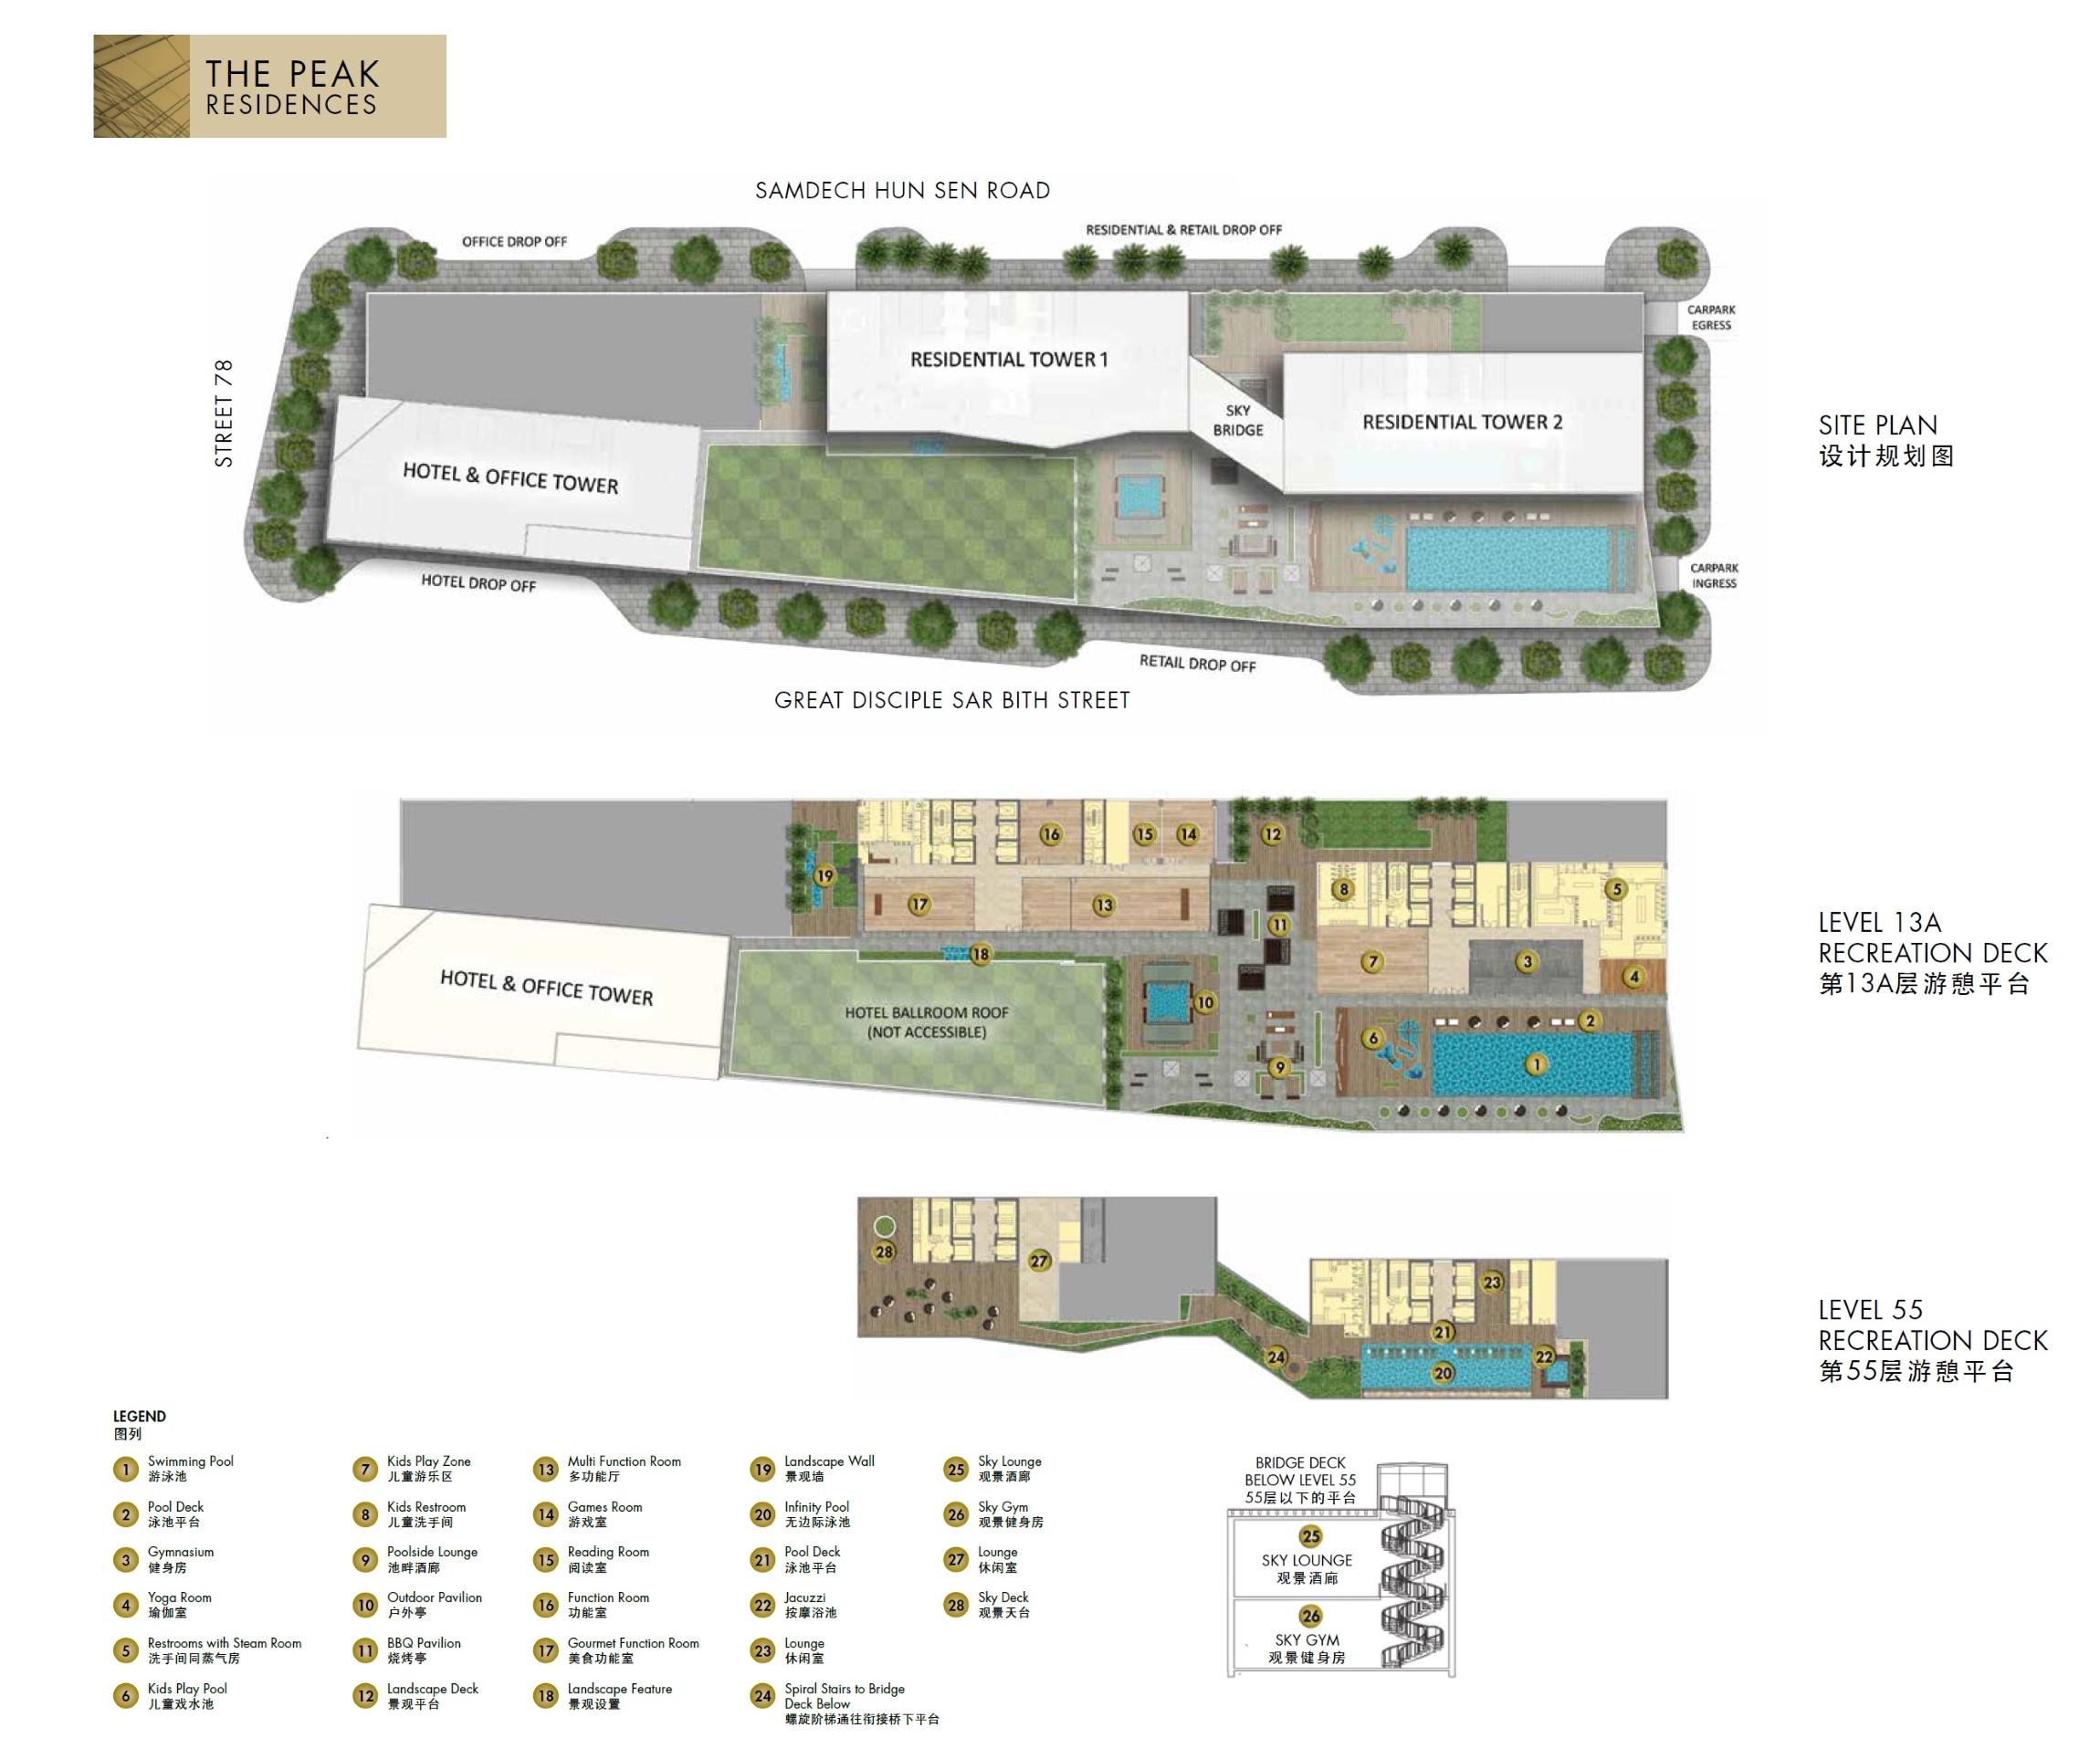 The Peak Residences @ Cambodia site plan